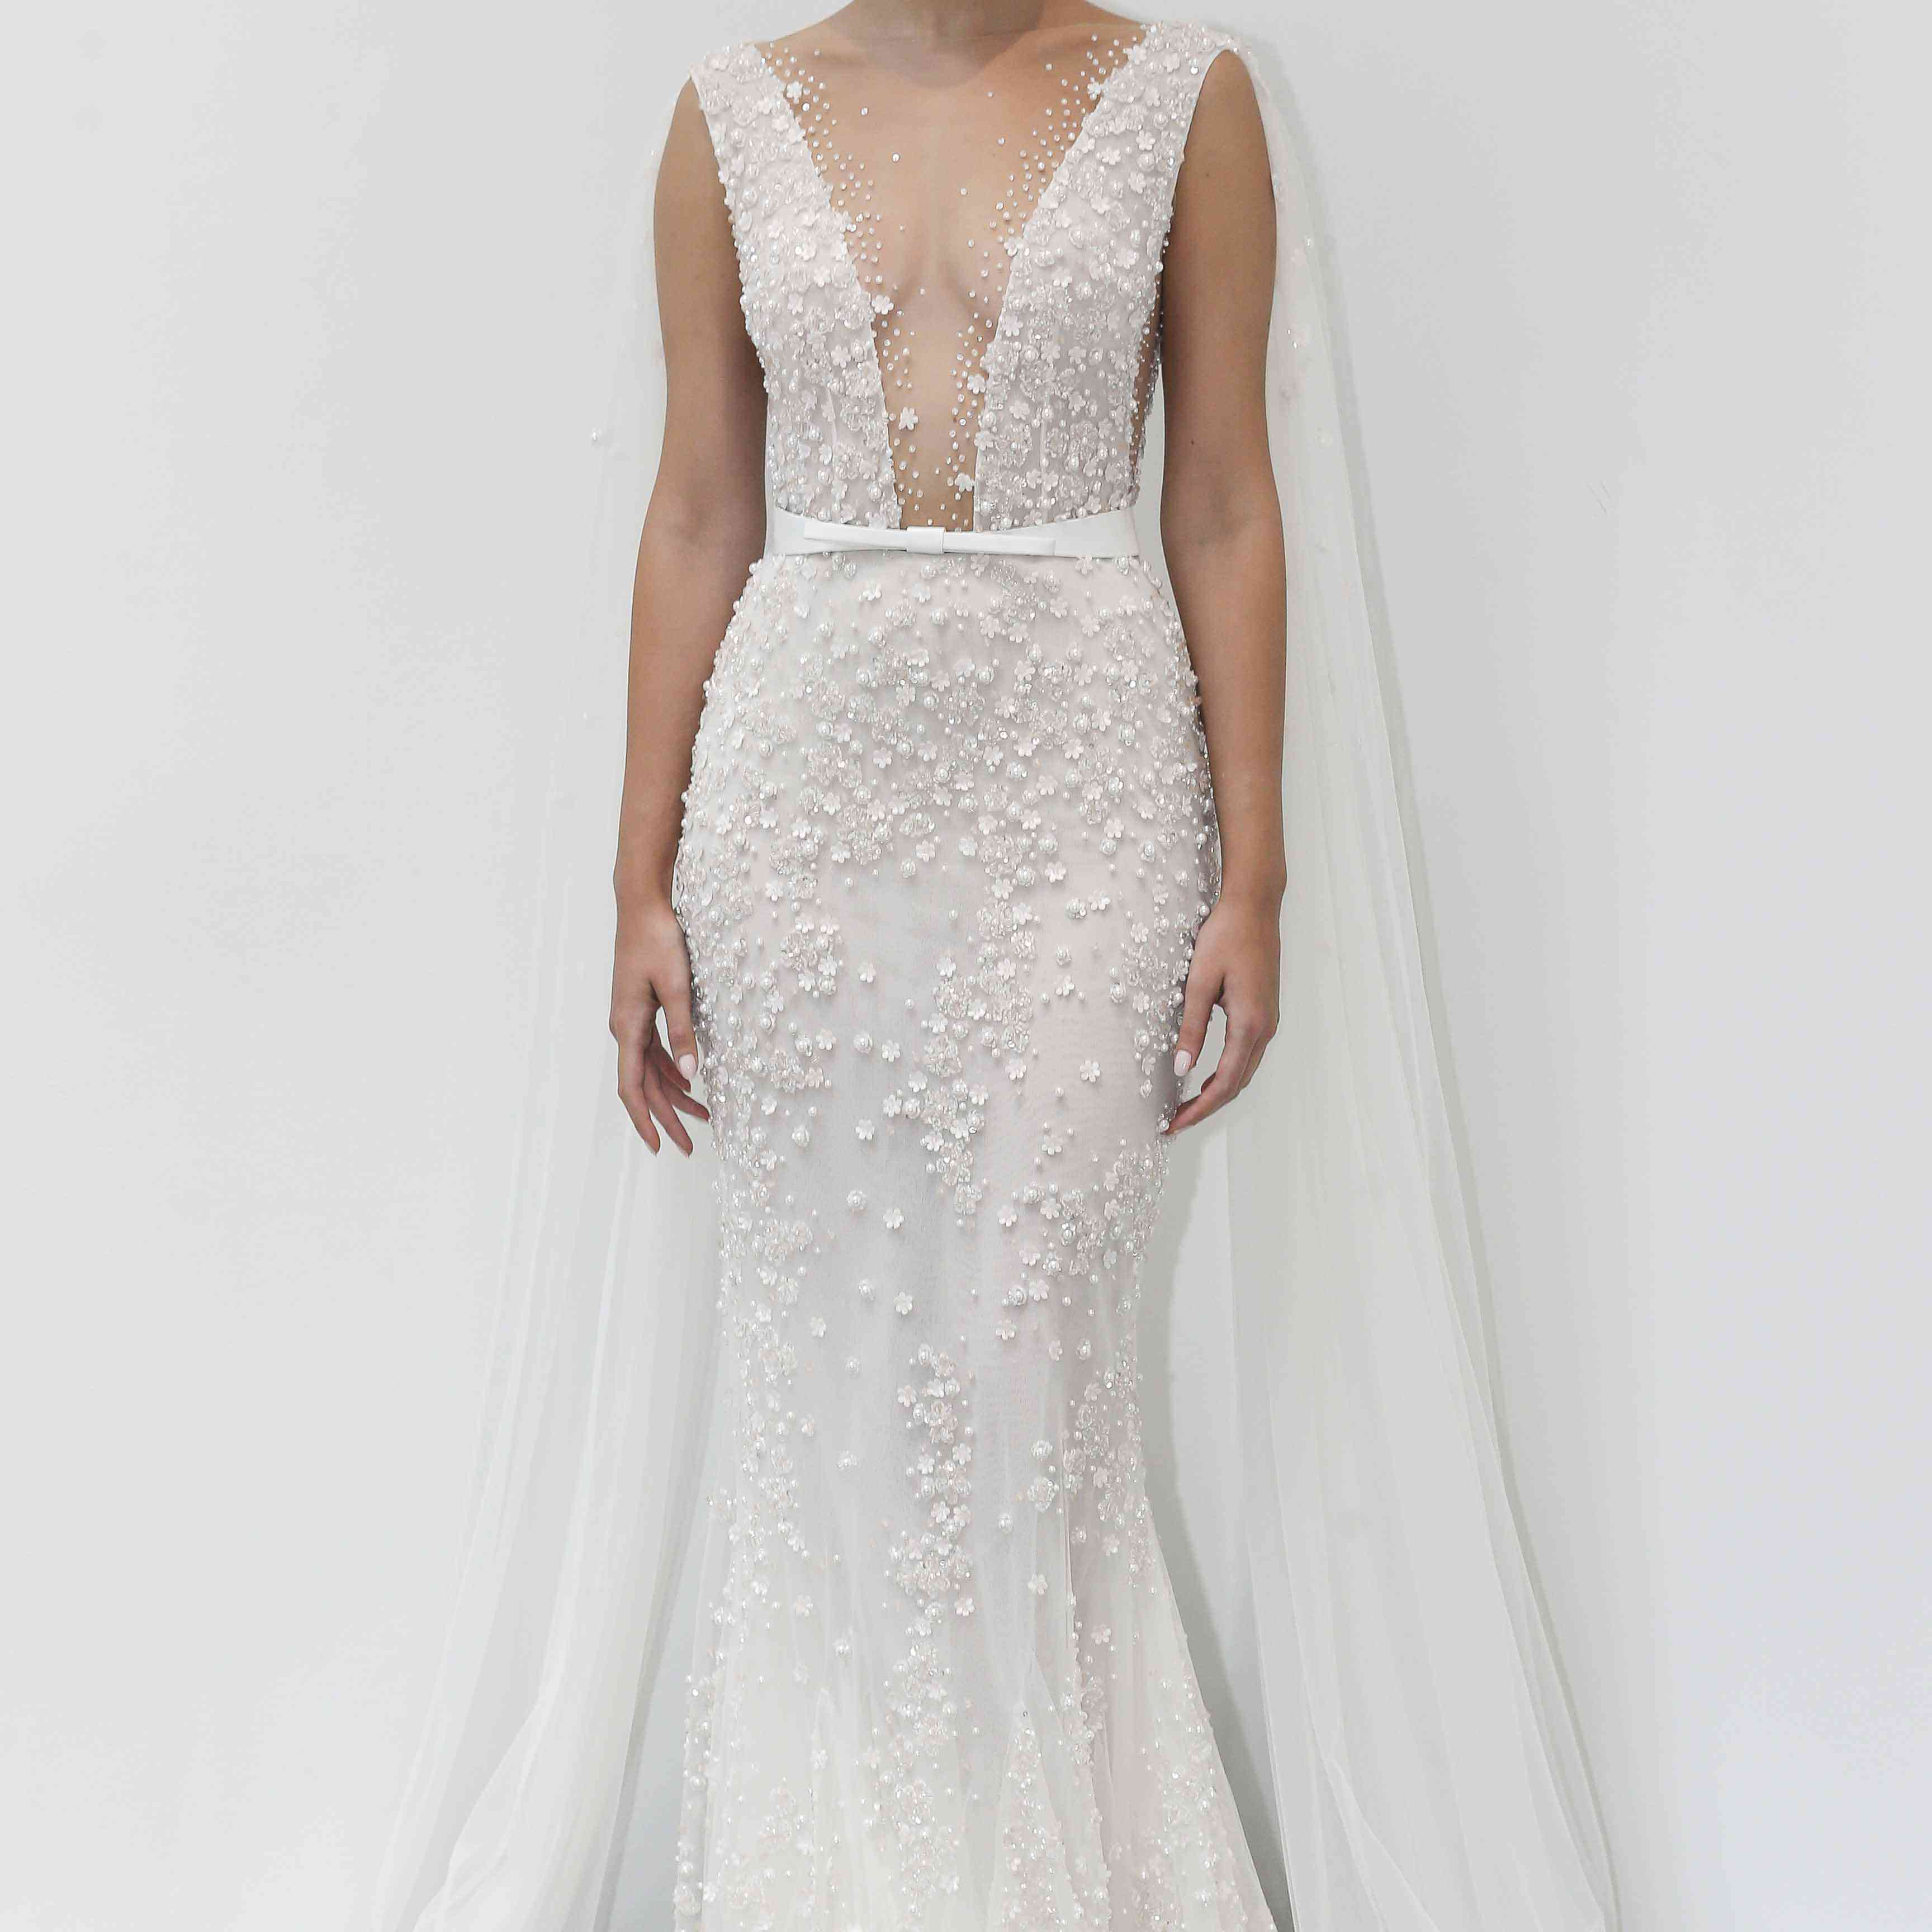 Magnolia sleeveless wedding dress